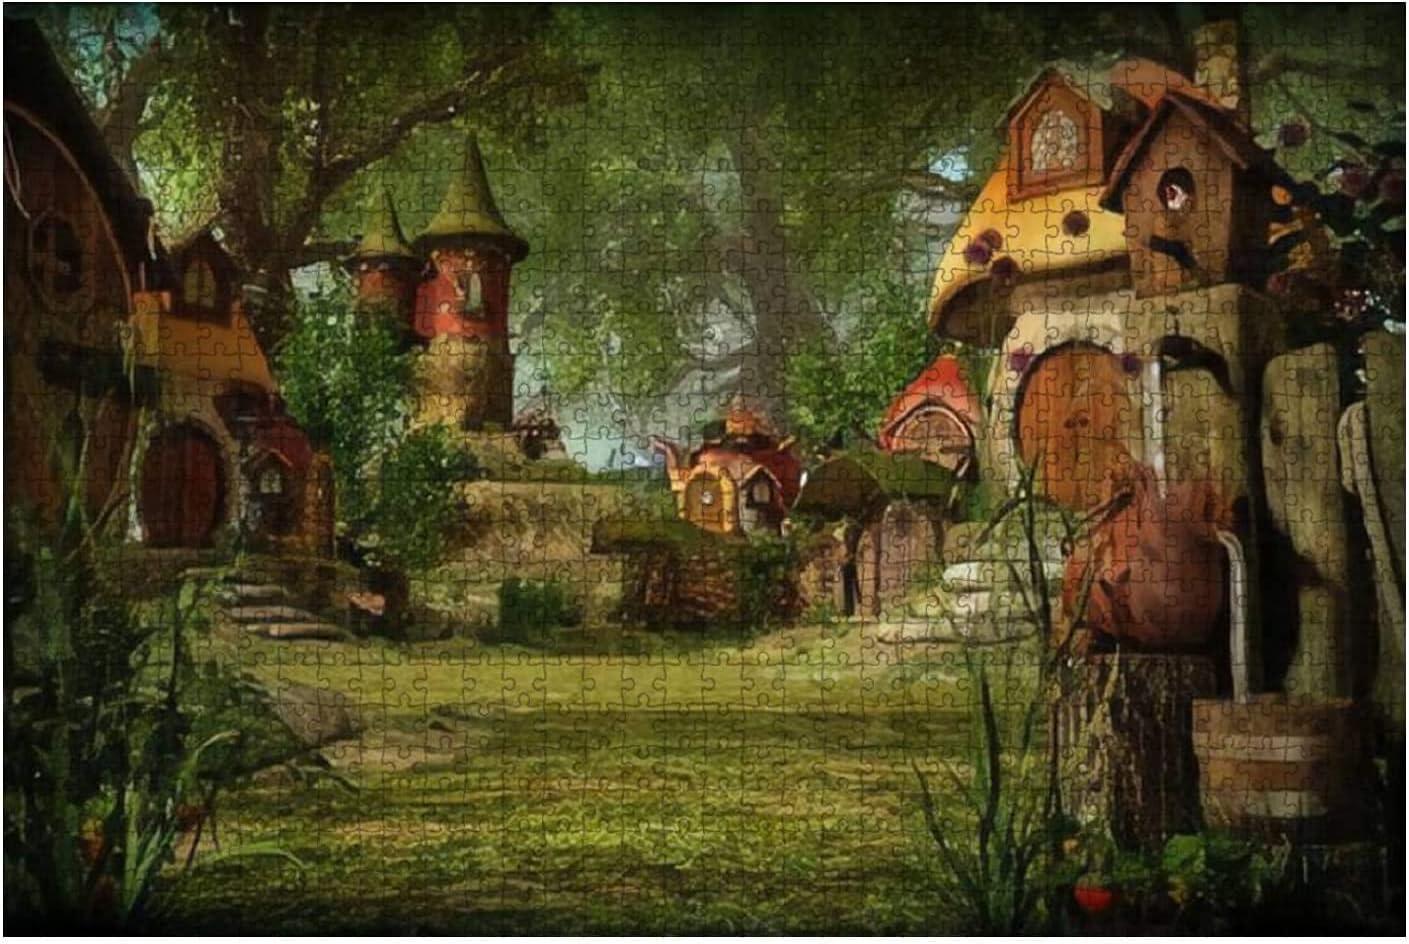 Bombing free shipping 1000 Pieces-Bilbo Baggins Home and Set Hobbit in Ranking TOP19 Garden Hobbiton